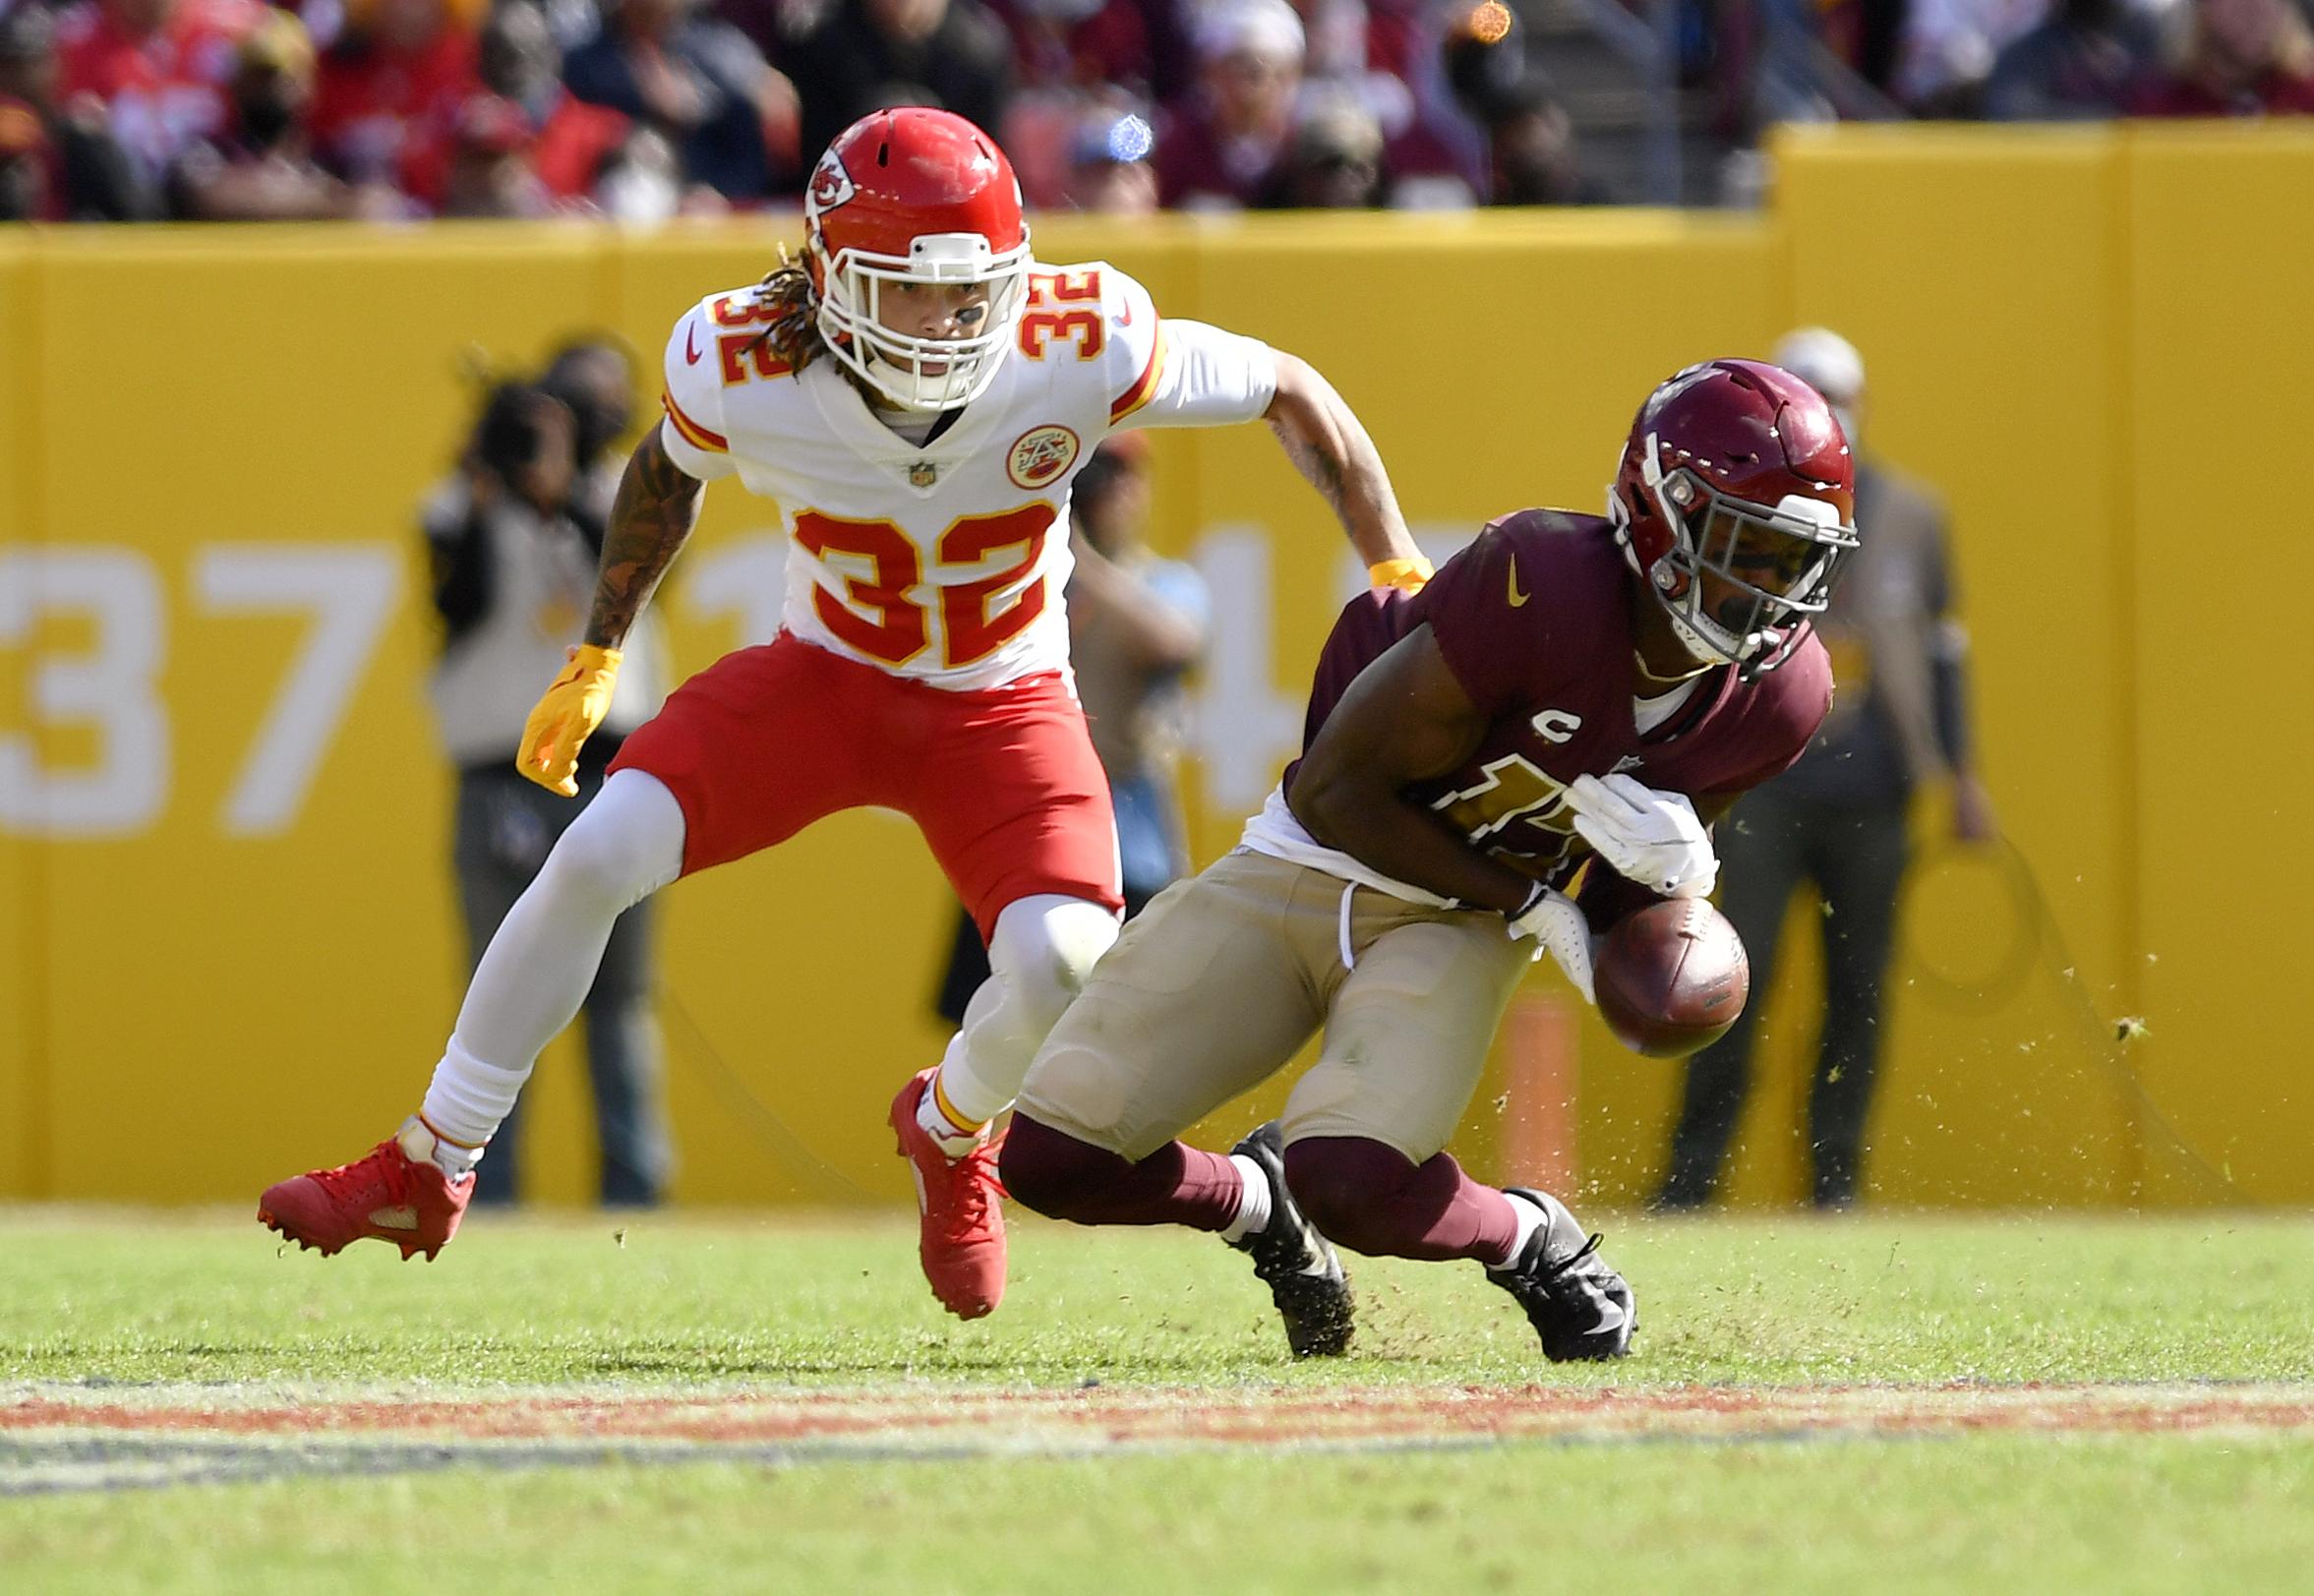 NFL: OCT 17 Chiefs at Washington Football Team